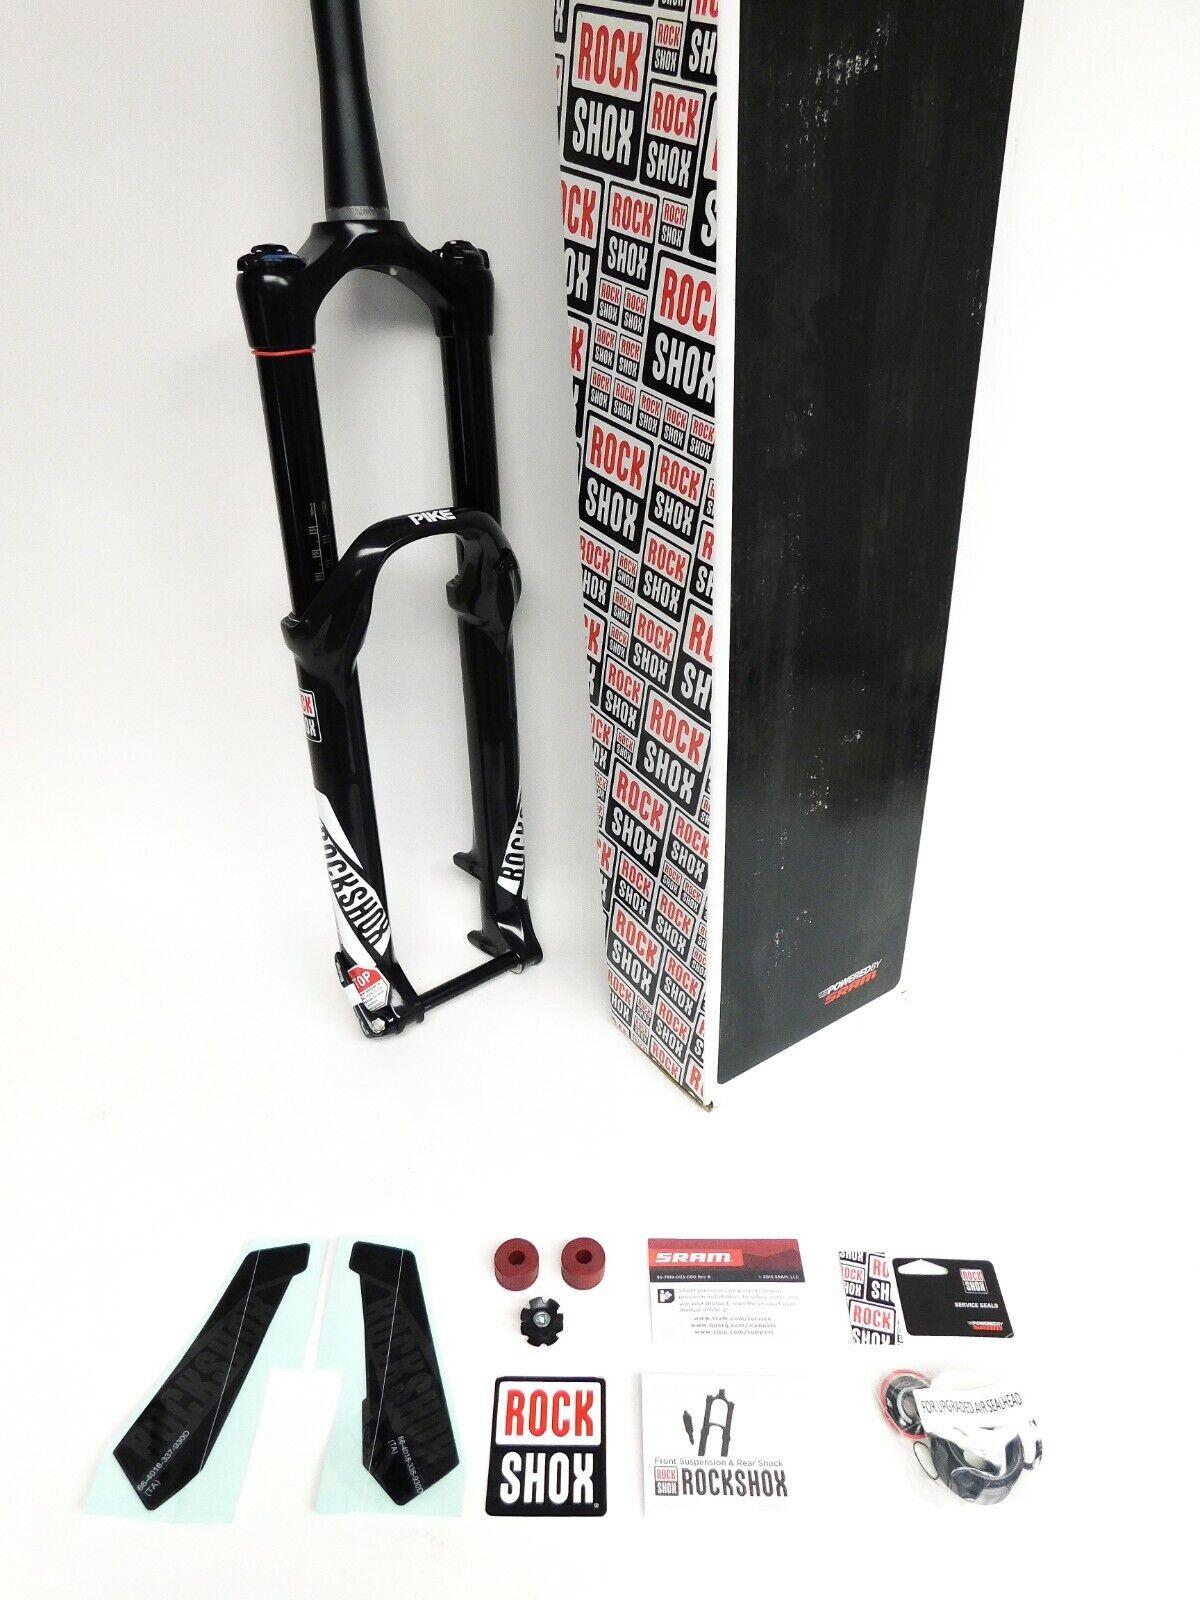 Rockshox Unisex Adult Leg Pike Bicycle Fork 1 Size Black